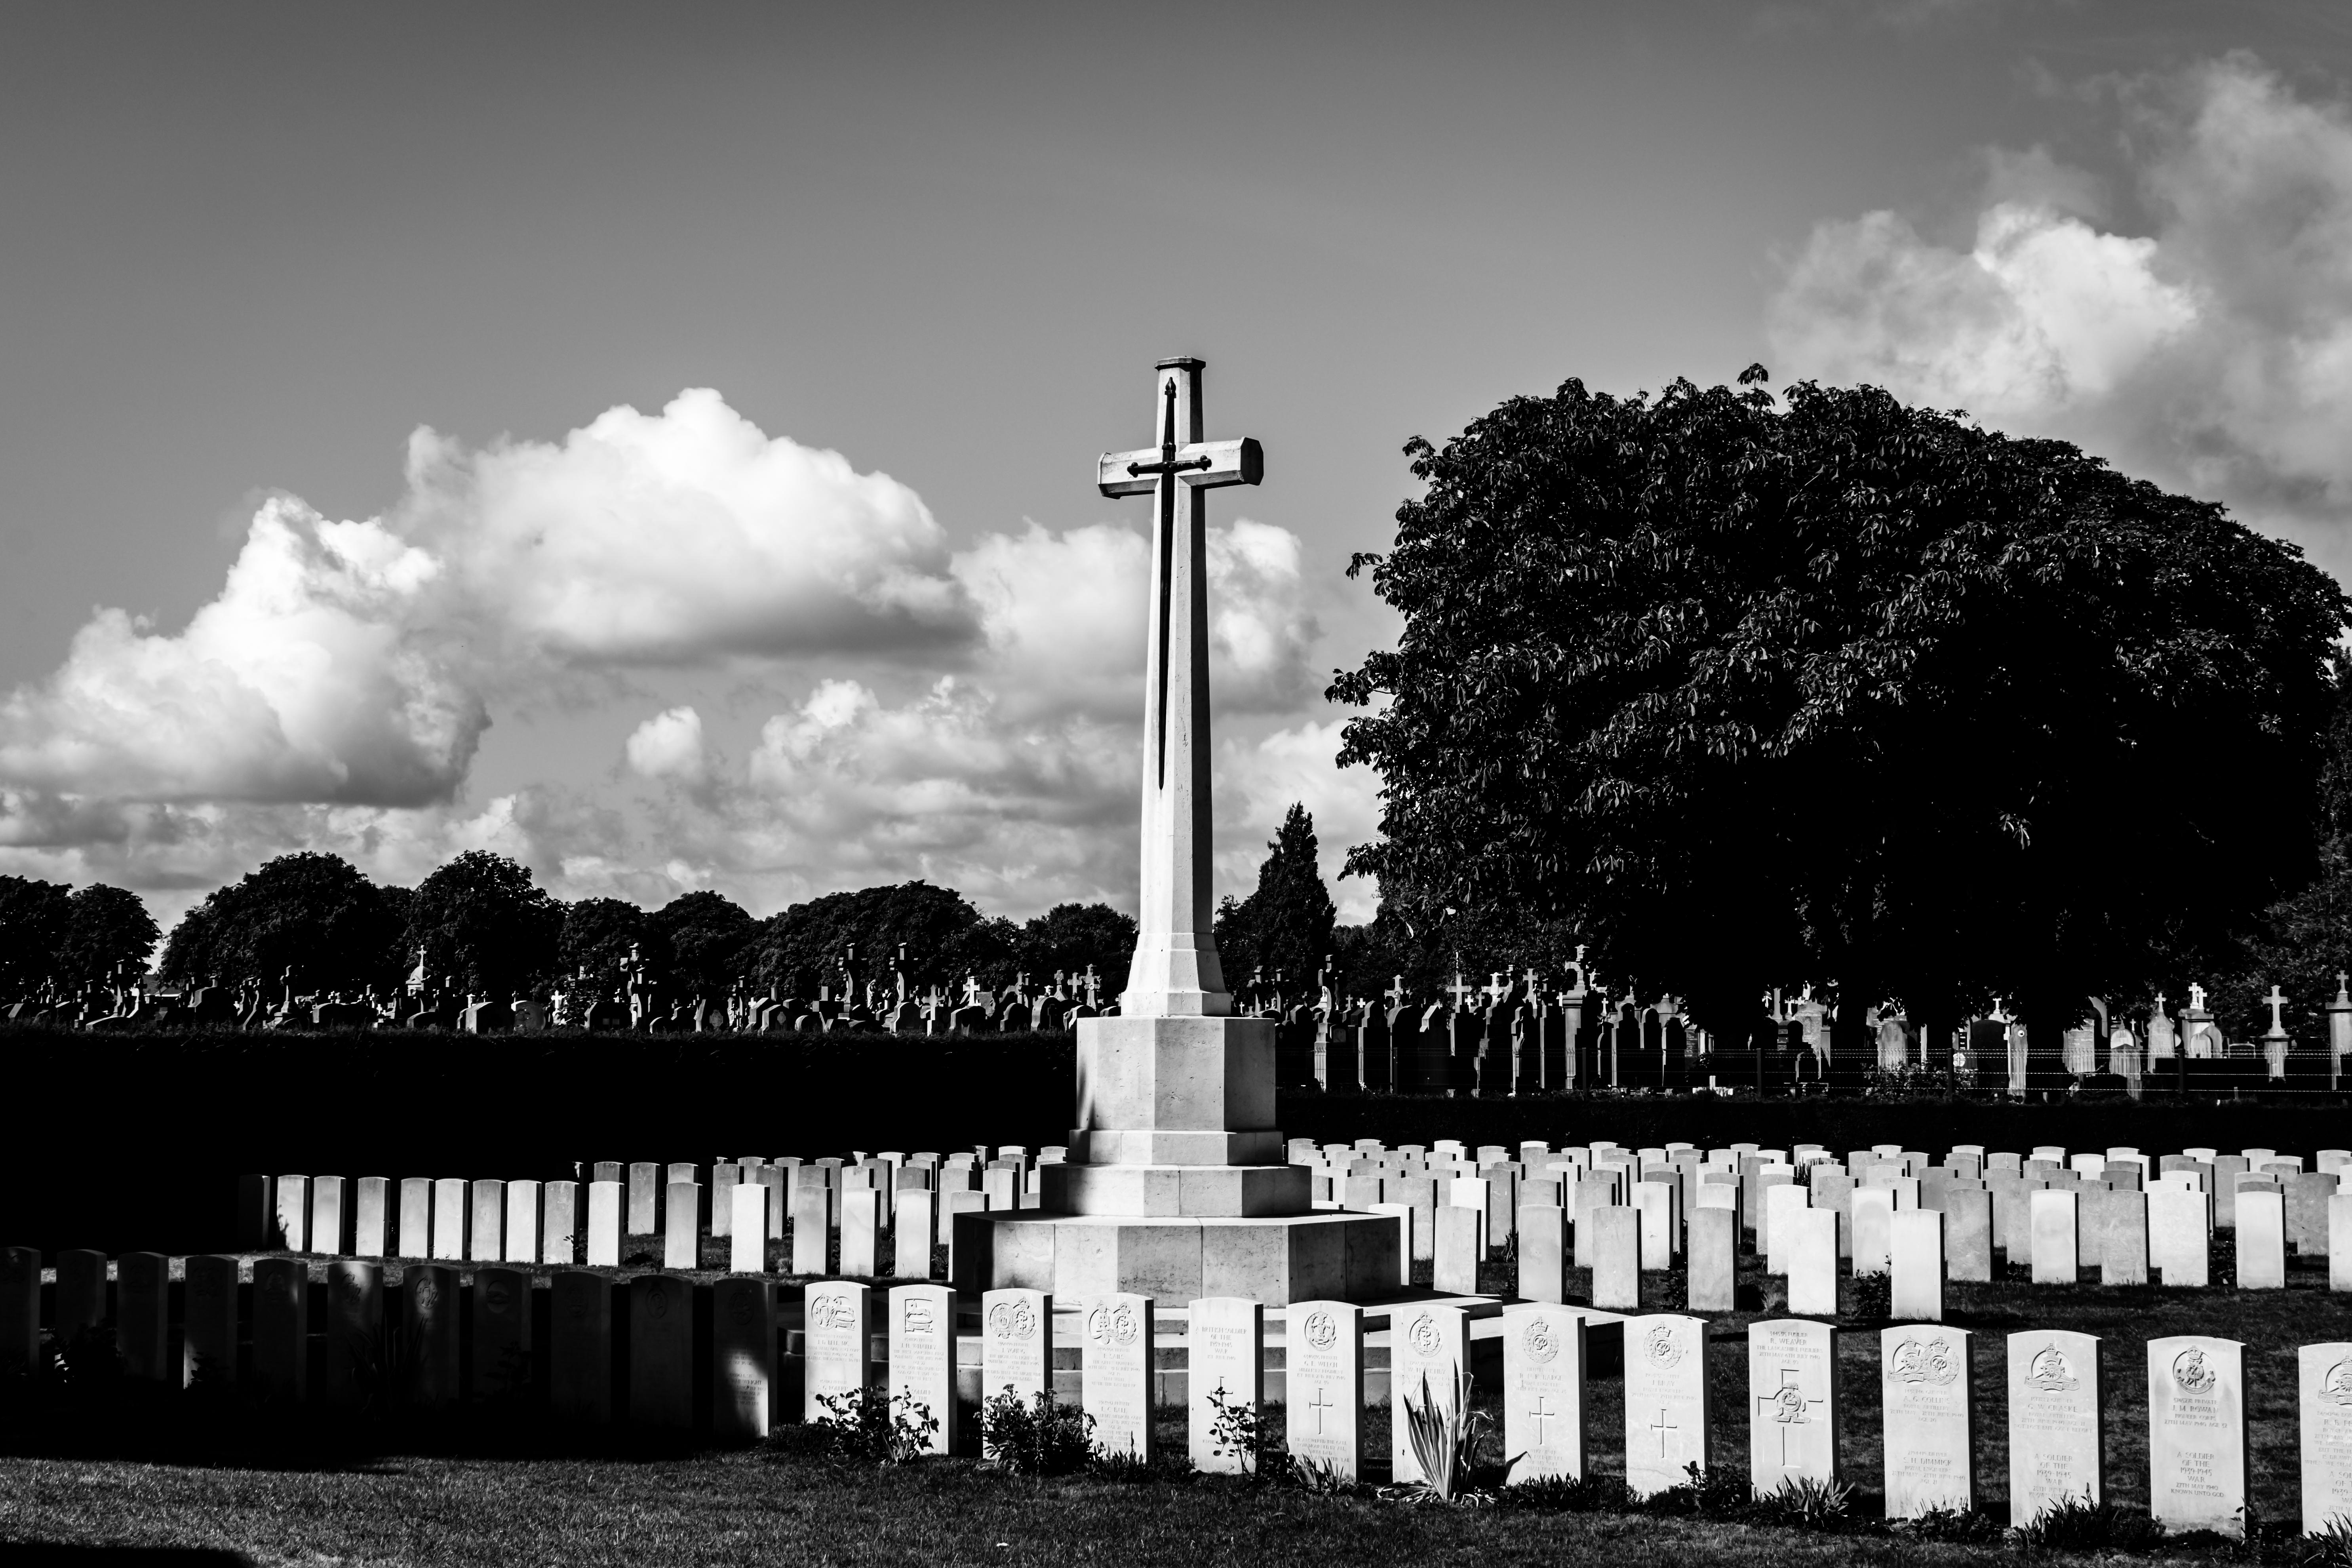 004n_FR_Dunkirk (3).jpg